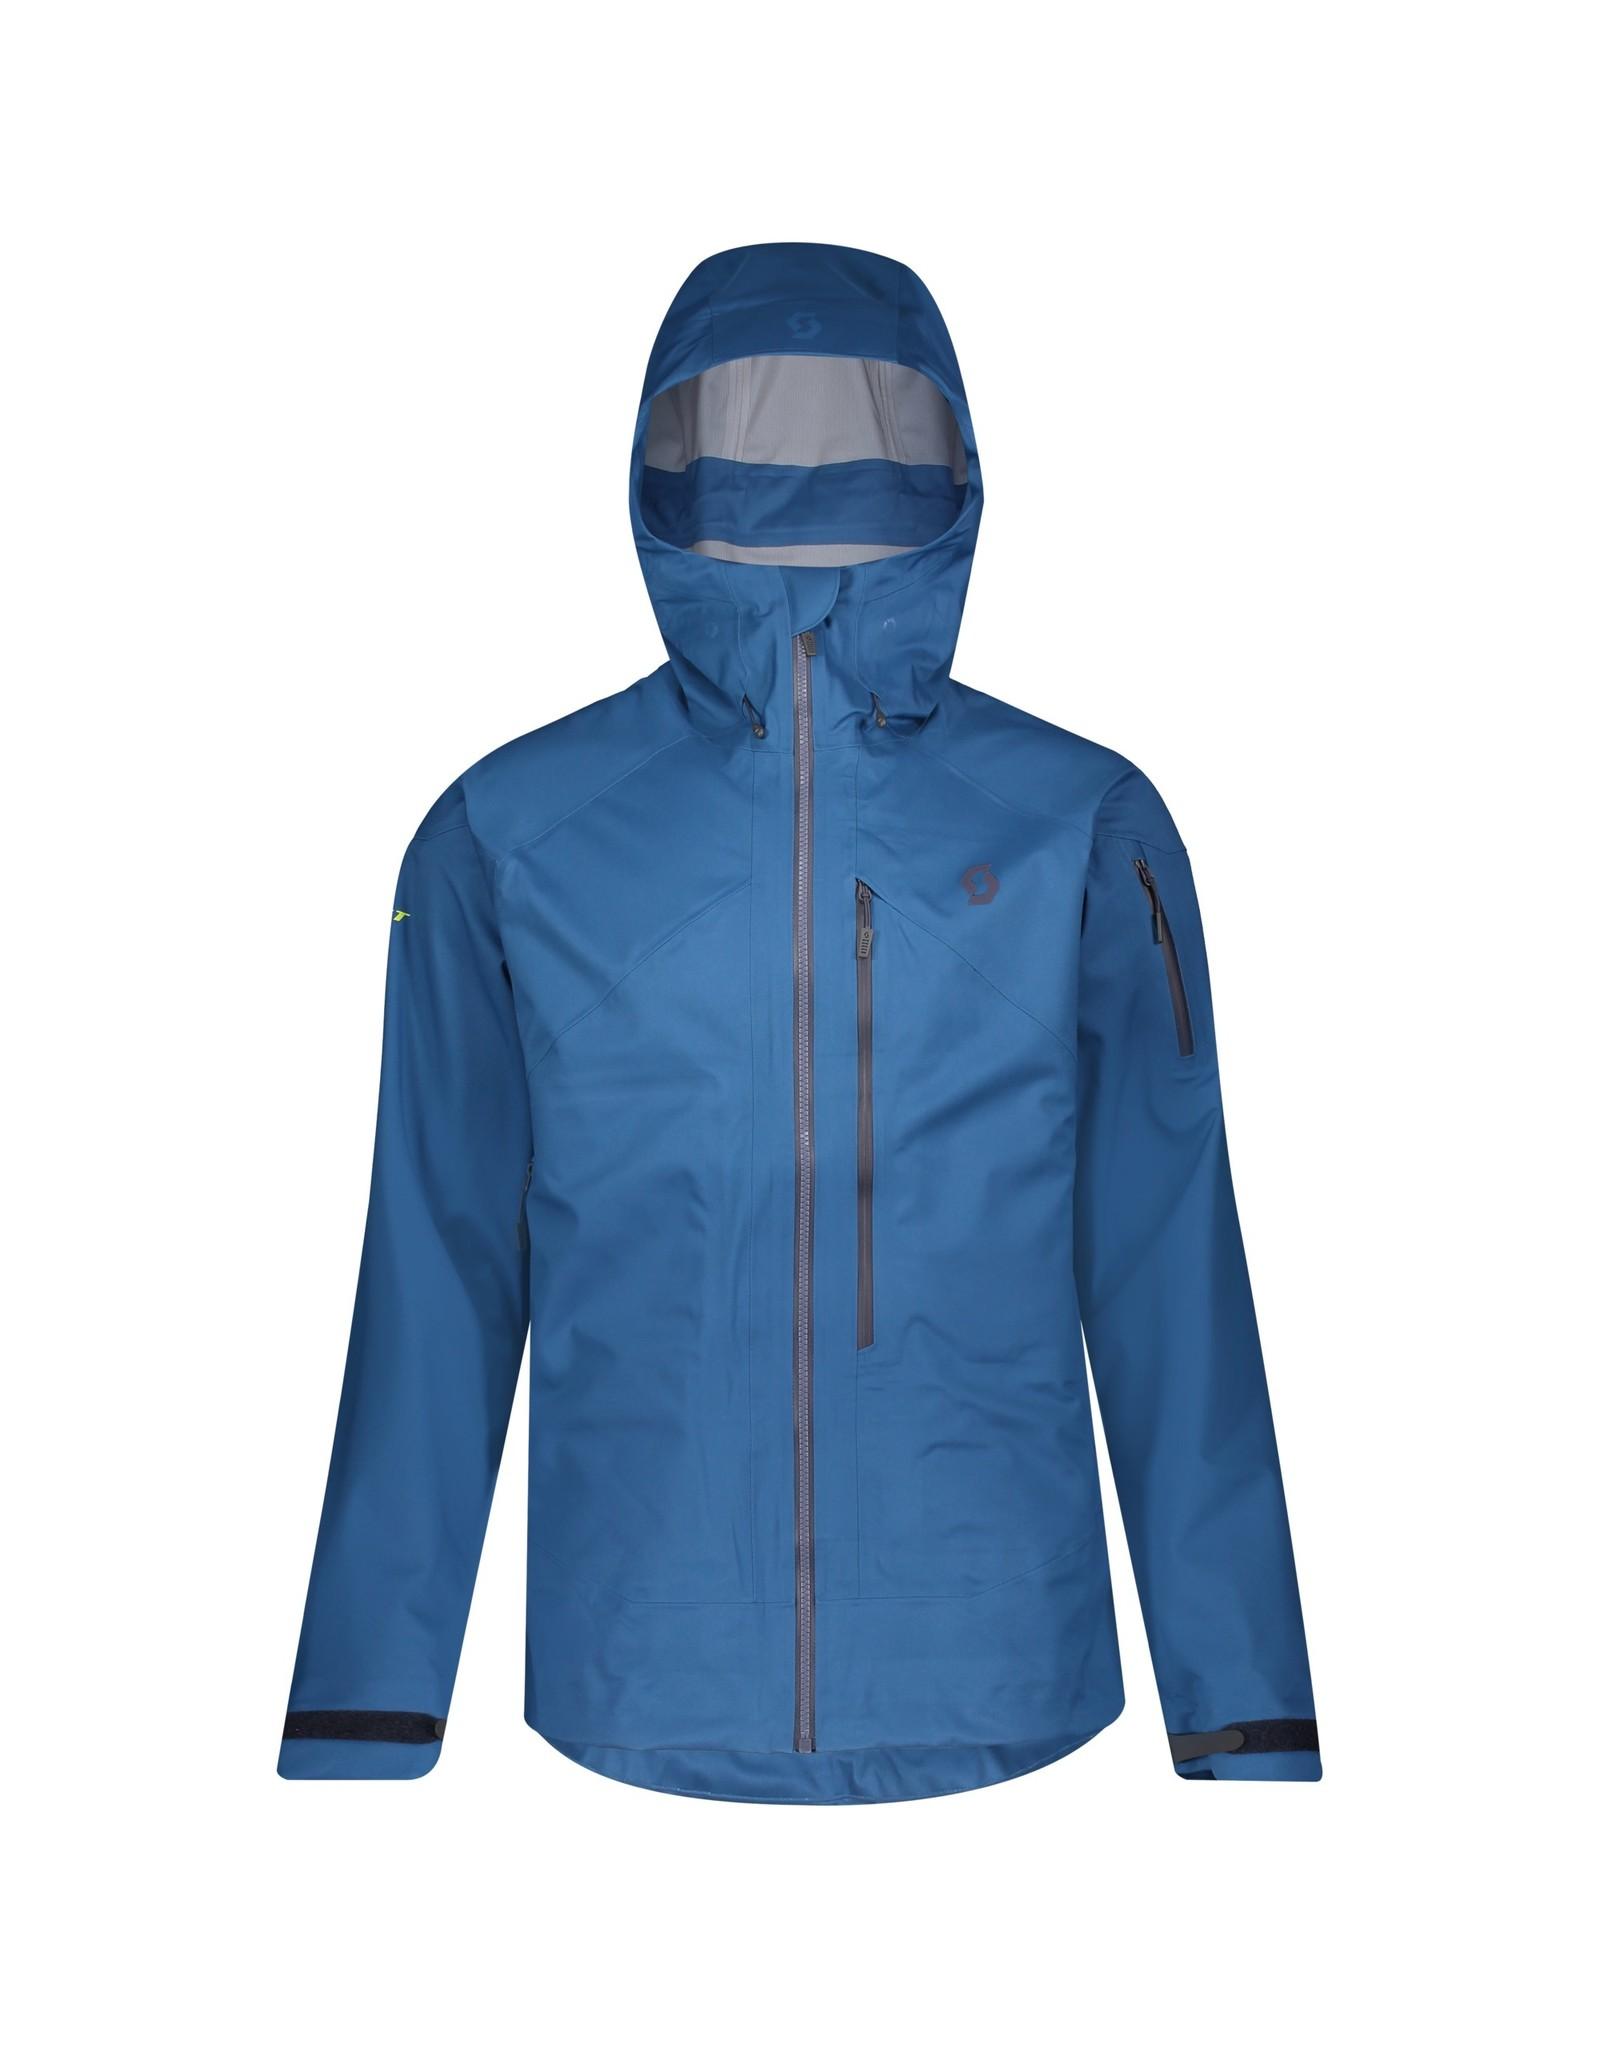 Scott Explorair 3L Jacket Blue Sapphire 2020